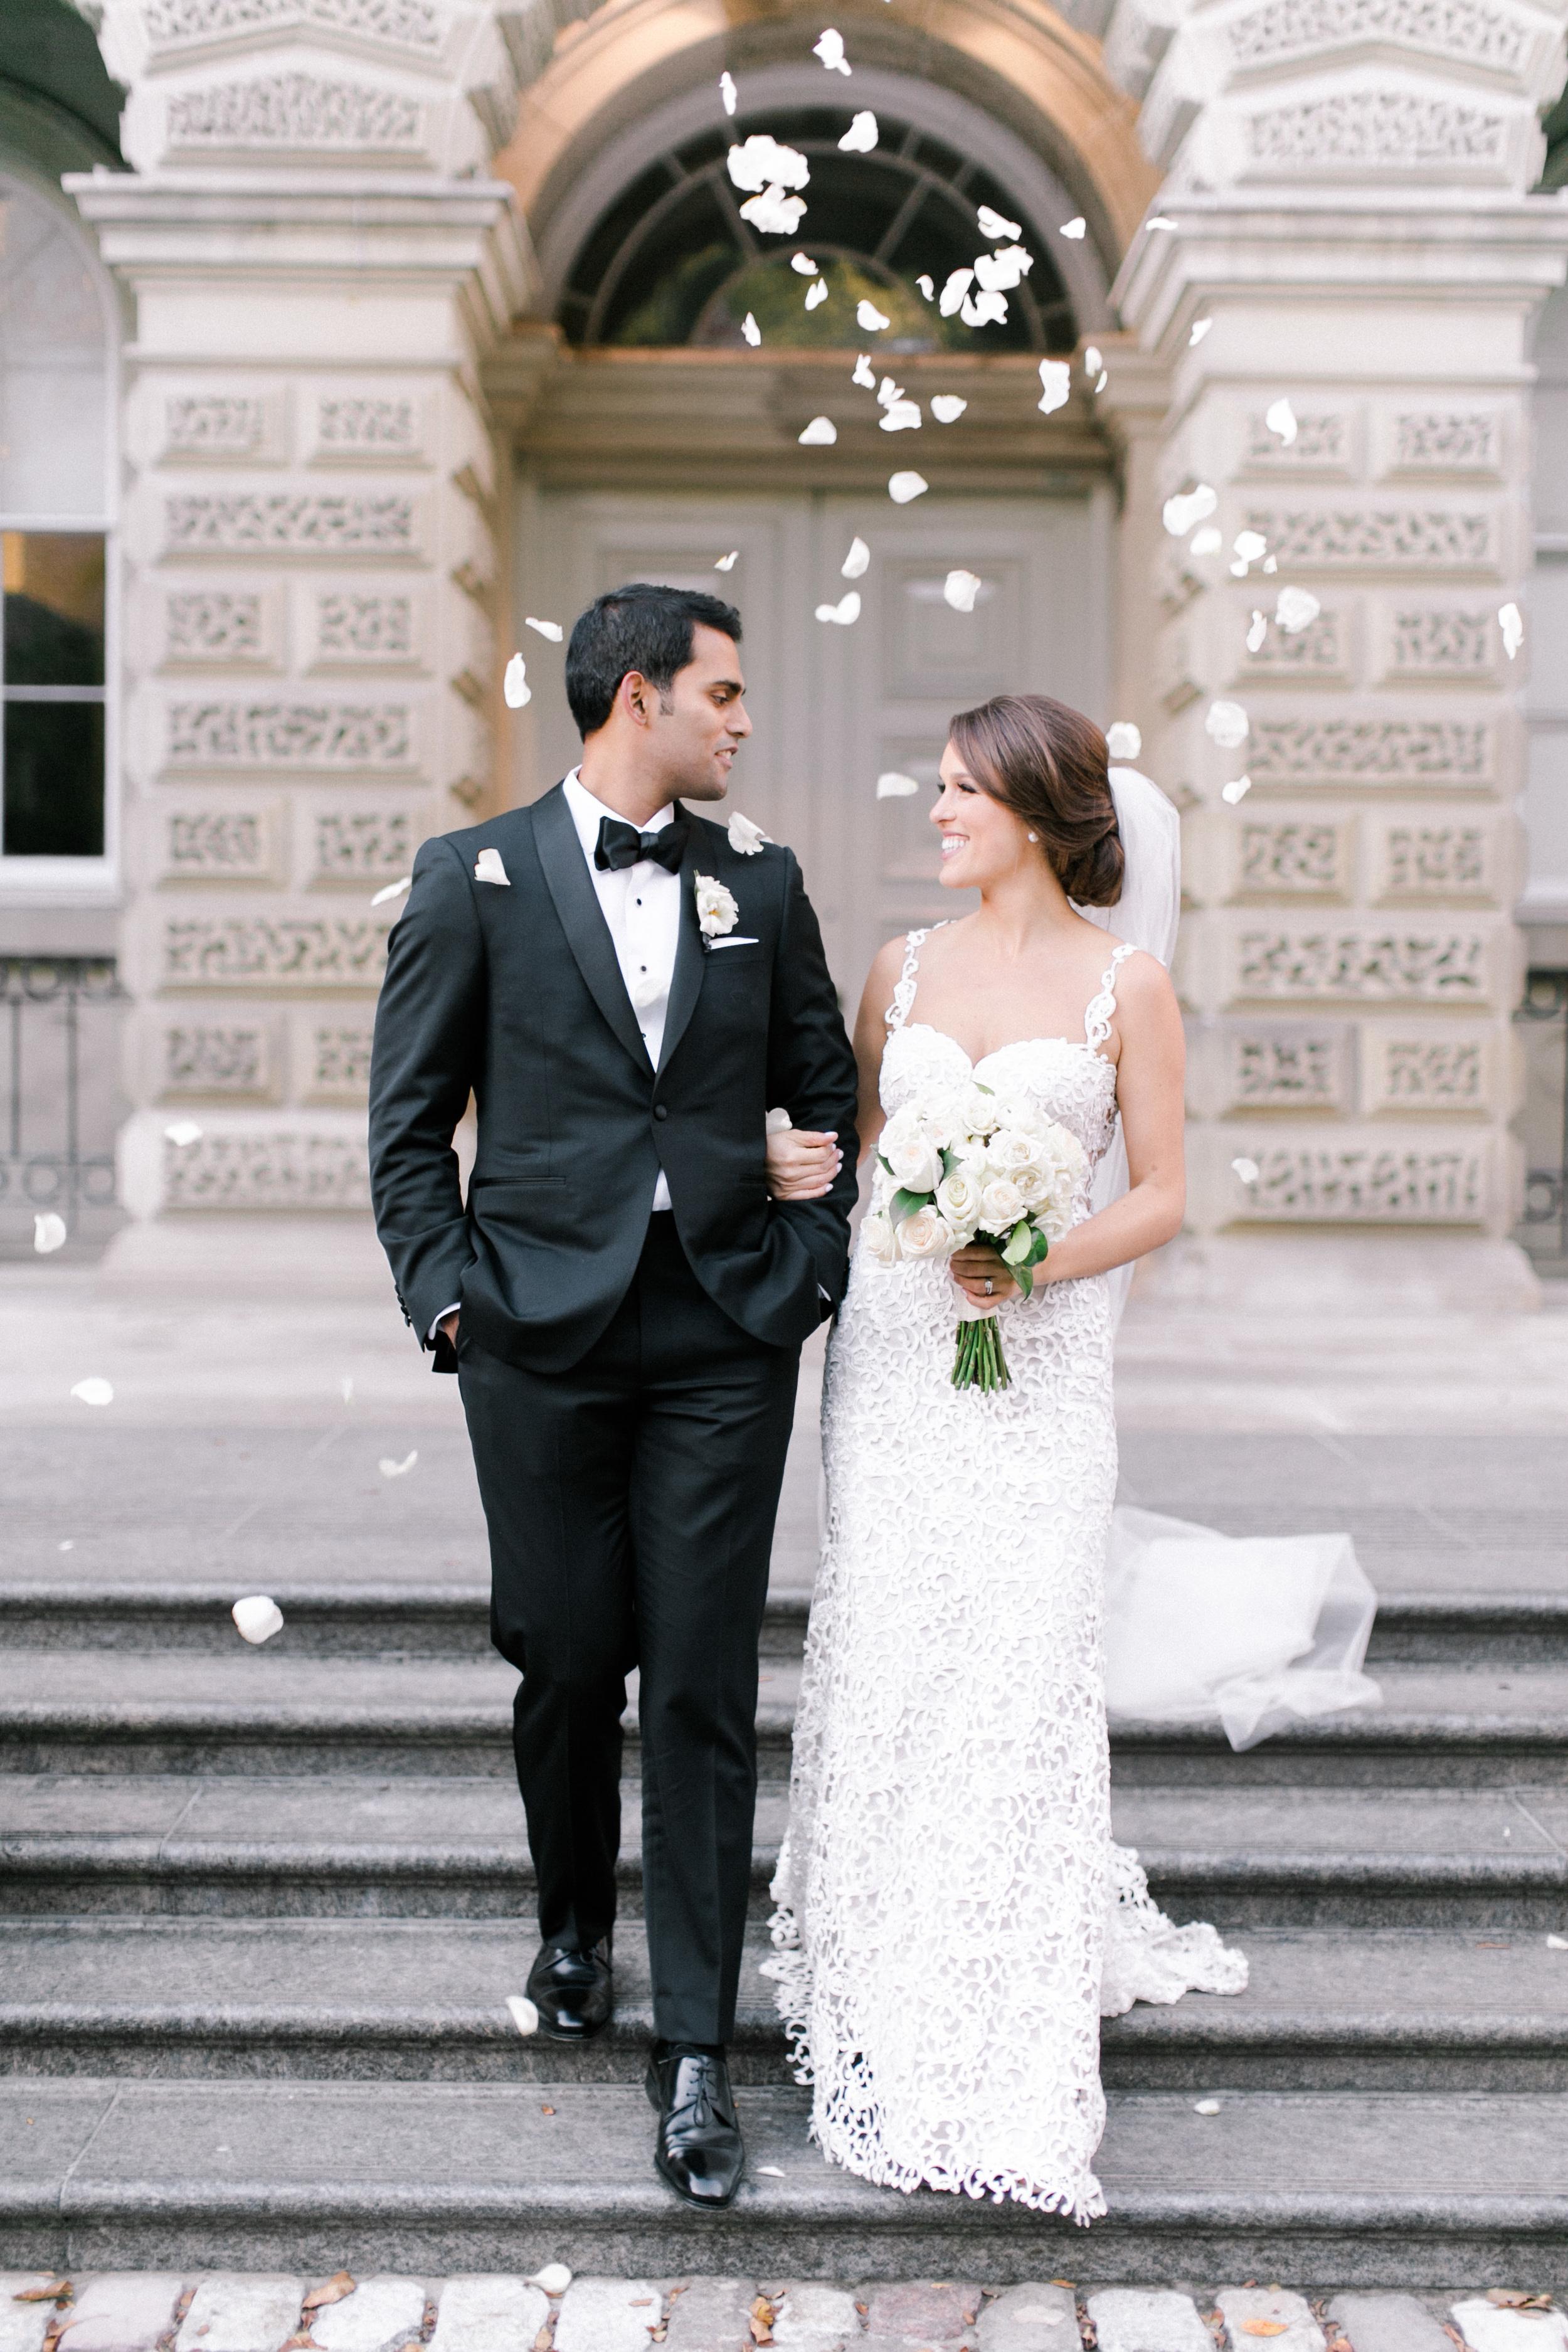 arcadian-court-loft-toronto-wedding-photographer-richelle-hunter-cassandra-mark-509.JPG